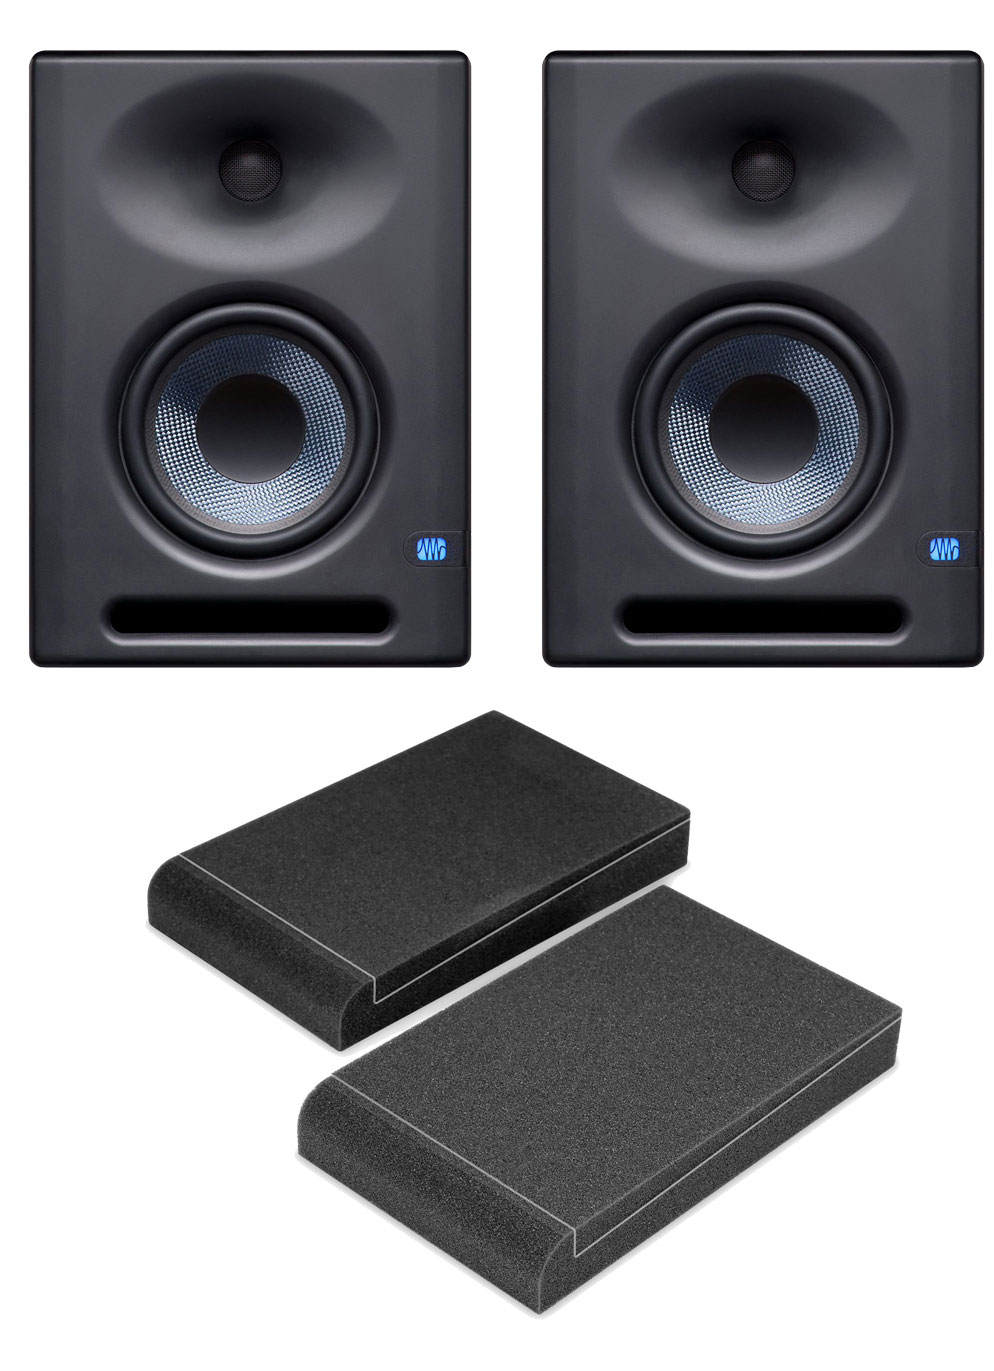 Studiomonitore - Presouns Eris E5 XT Aktives Studiomonitor Paar inkl. Absorberplatten - Onlineshop Musikhaus Kirstein